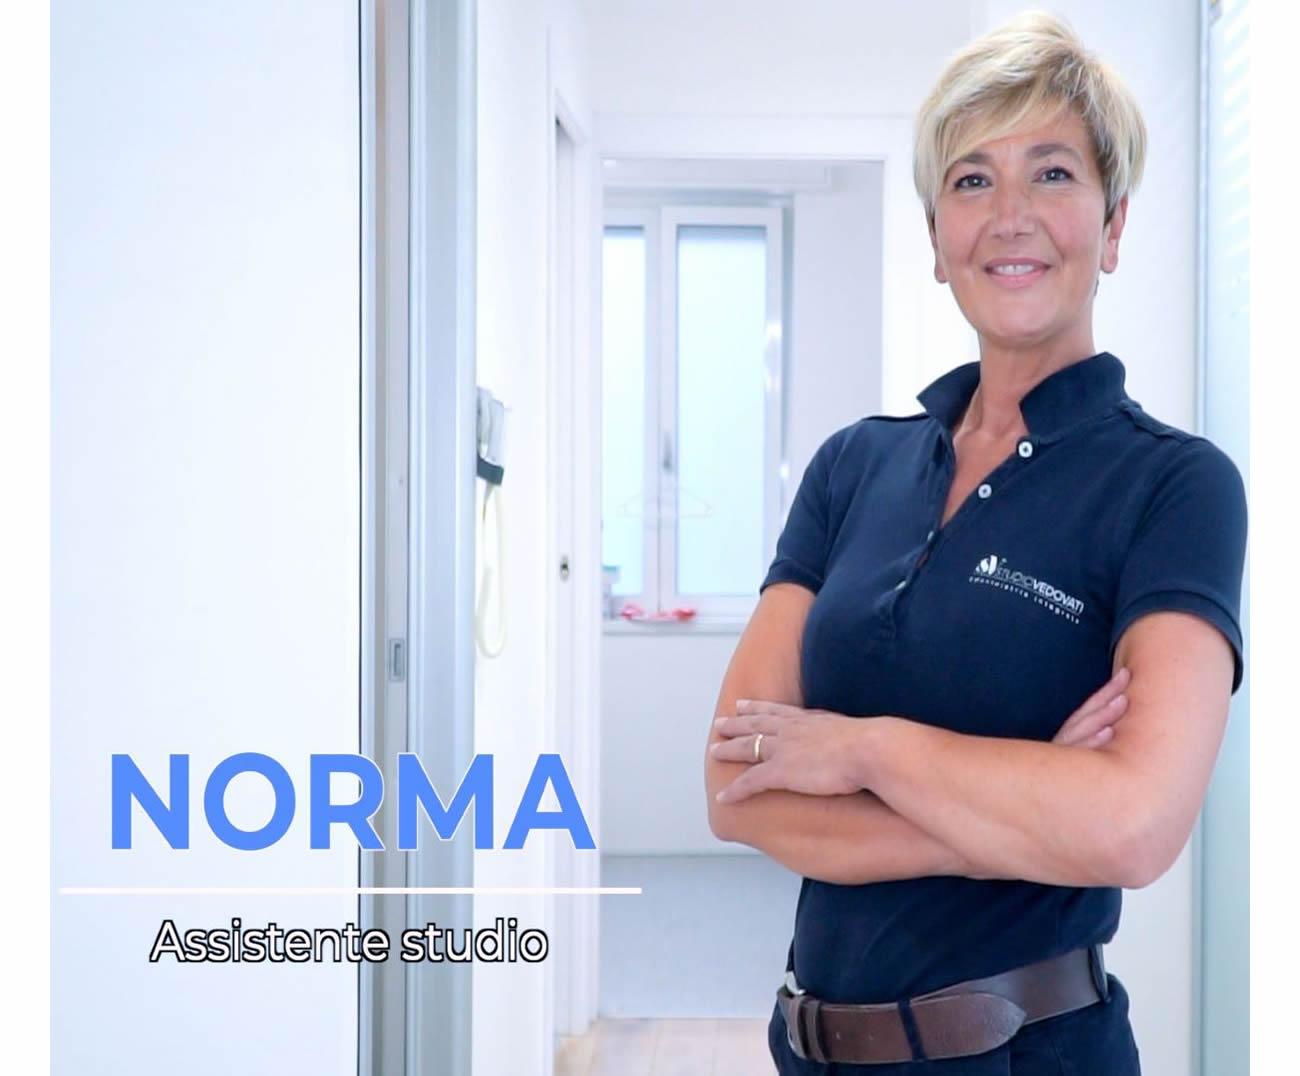 https://www.studiovedovati.dental/wp-content/uploads/2021/01/norma-assistente-studio.jpg